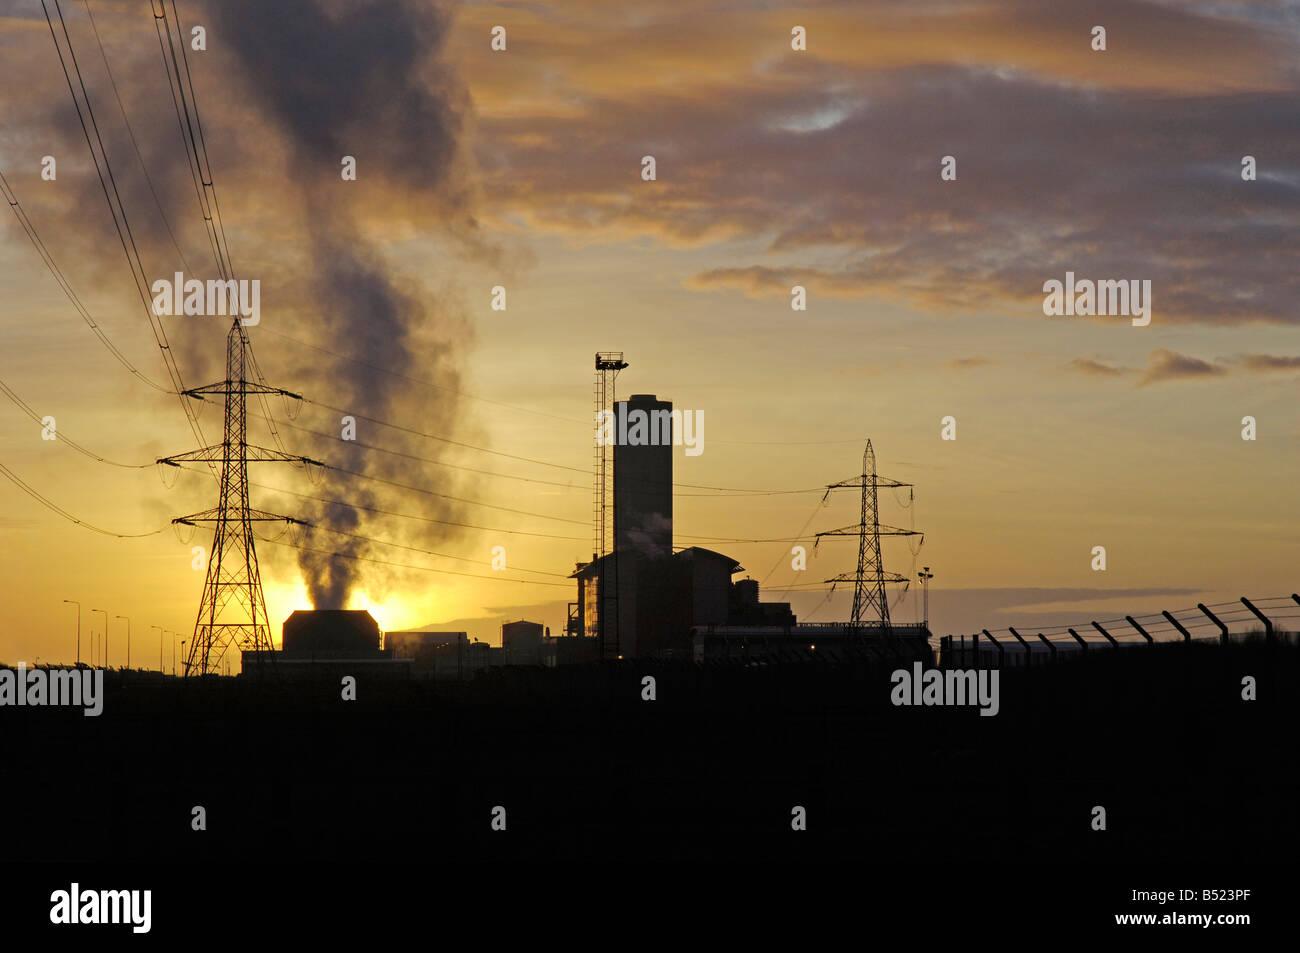 Briton Ferry Power Station at sunset Neath West Glamorgan Stock Photo